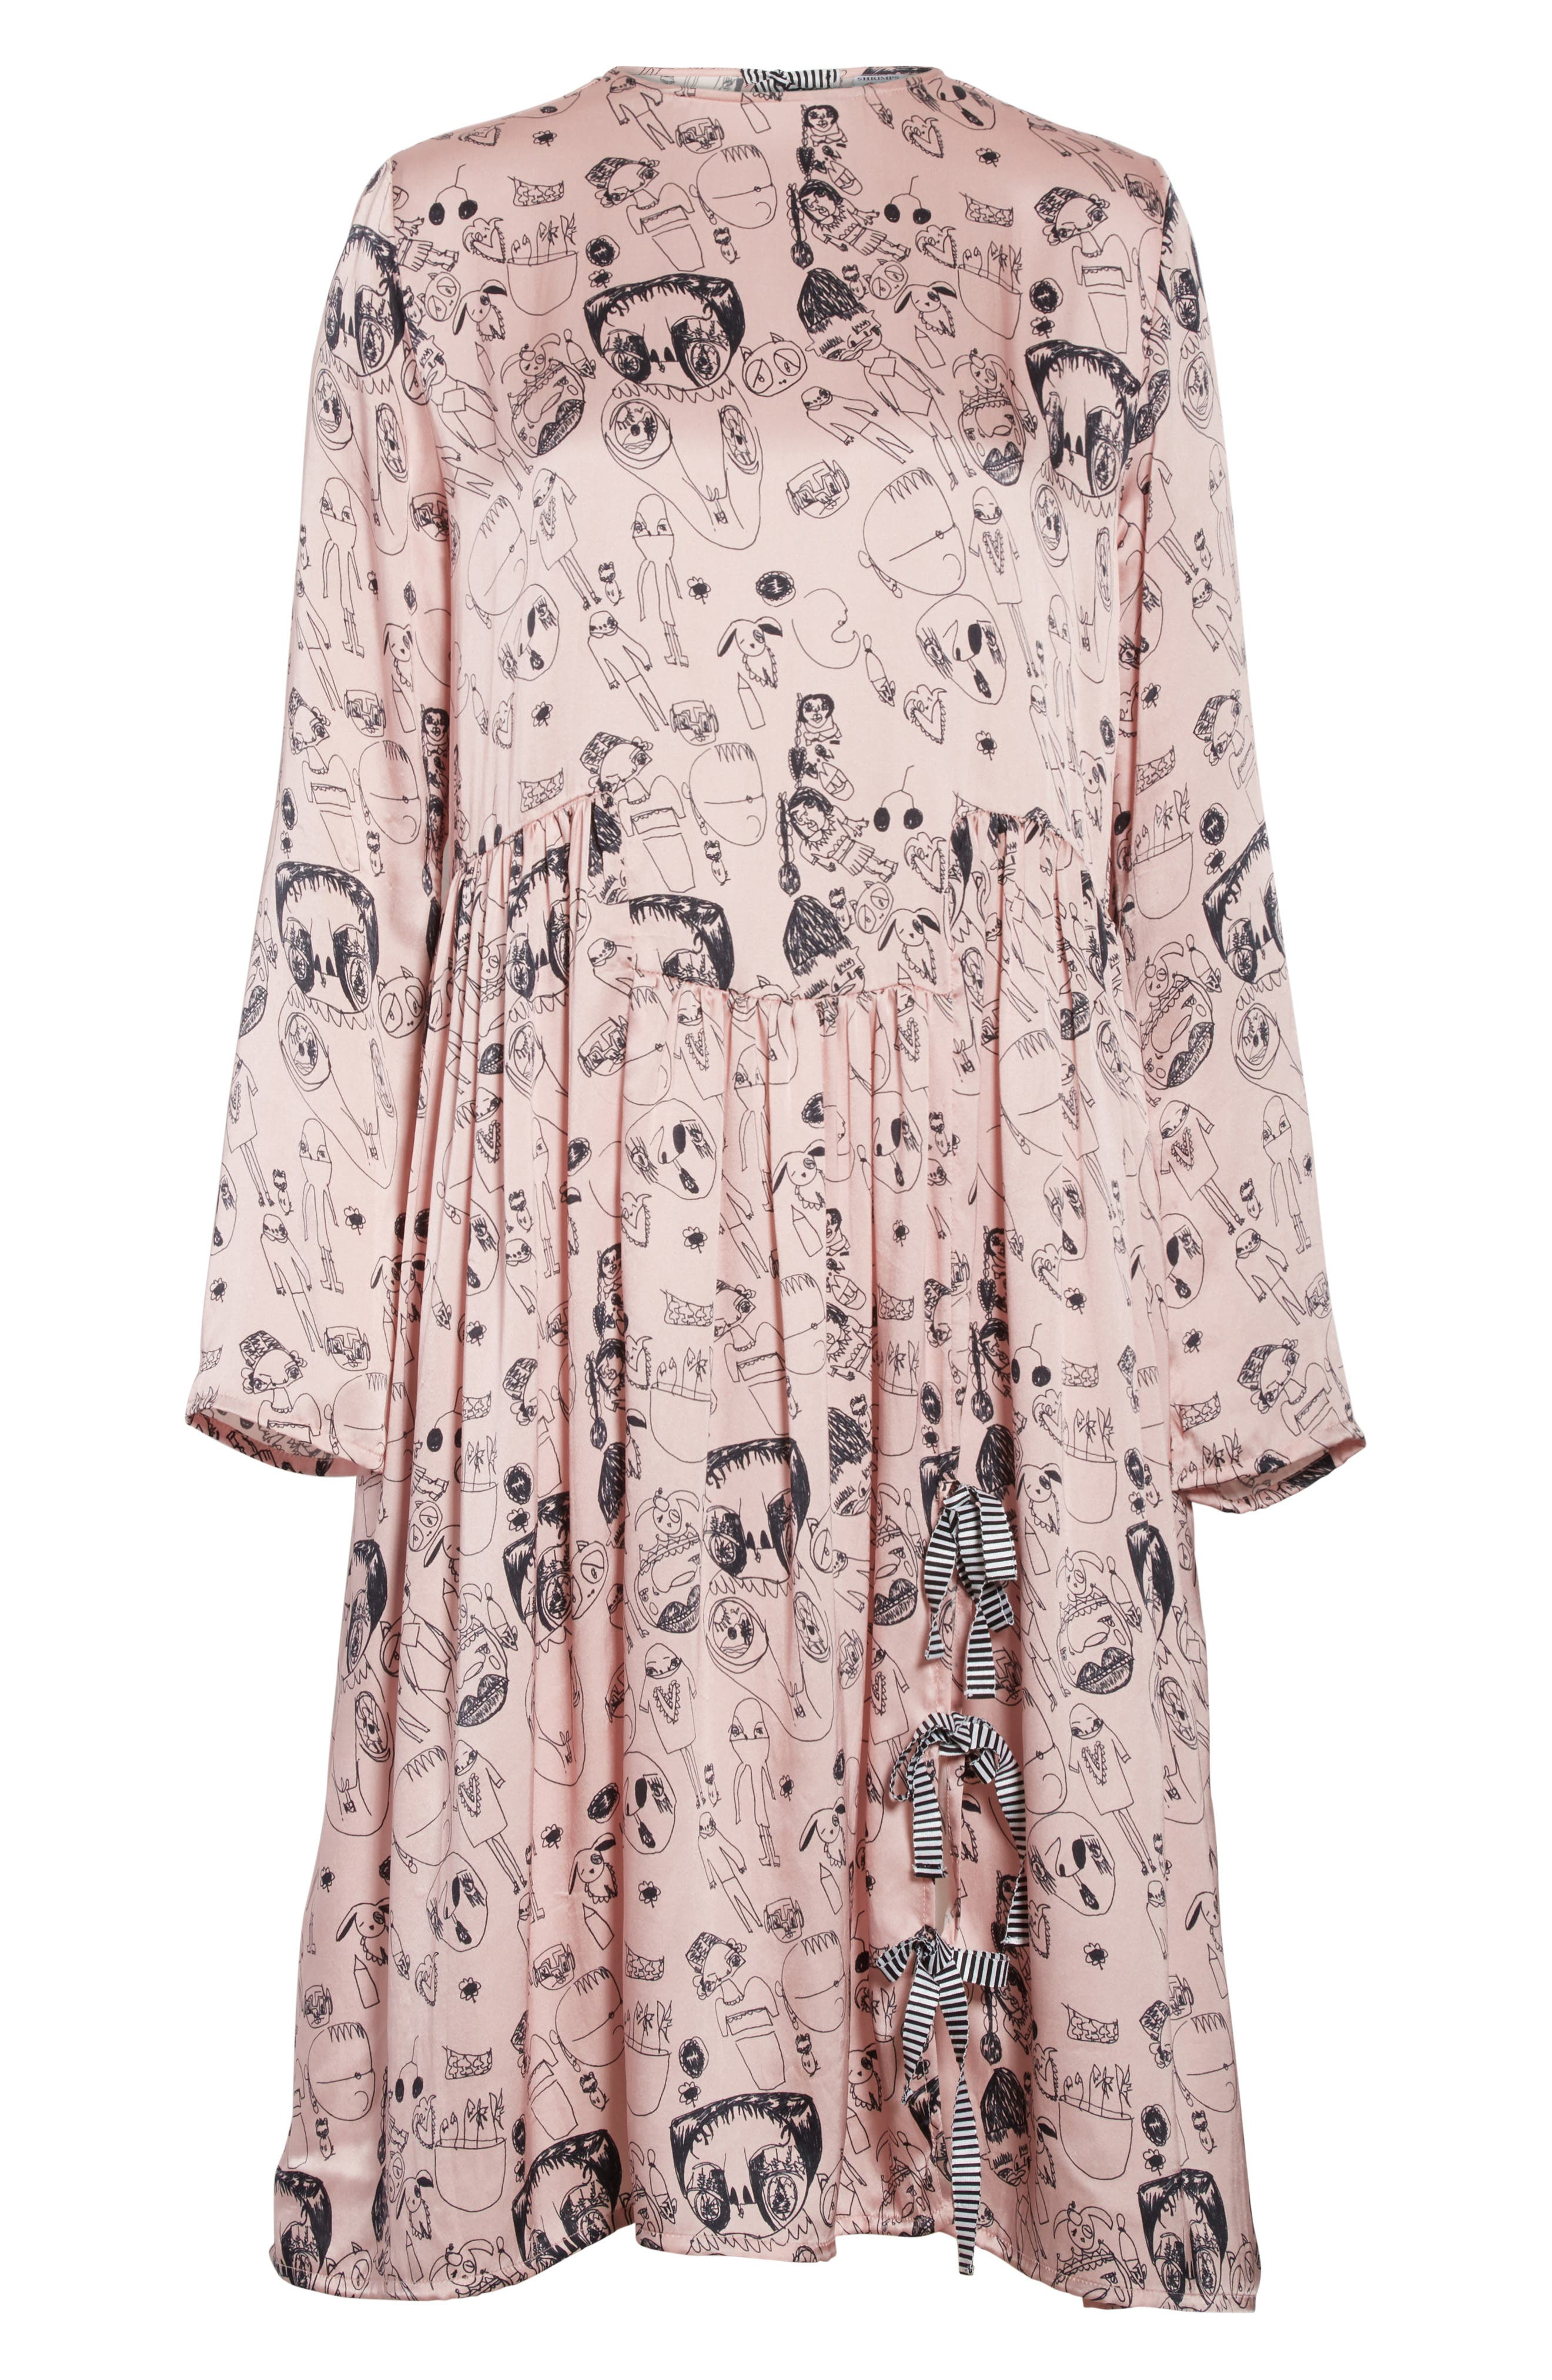 Heather Print Silk Dress,                             Alternate thumbnail 10, color,                             Rosette / Black